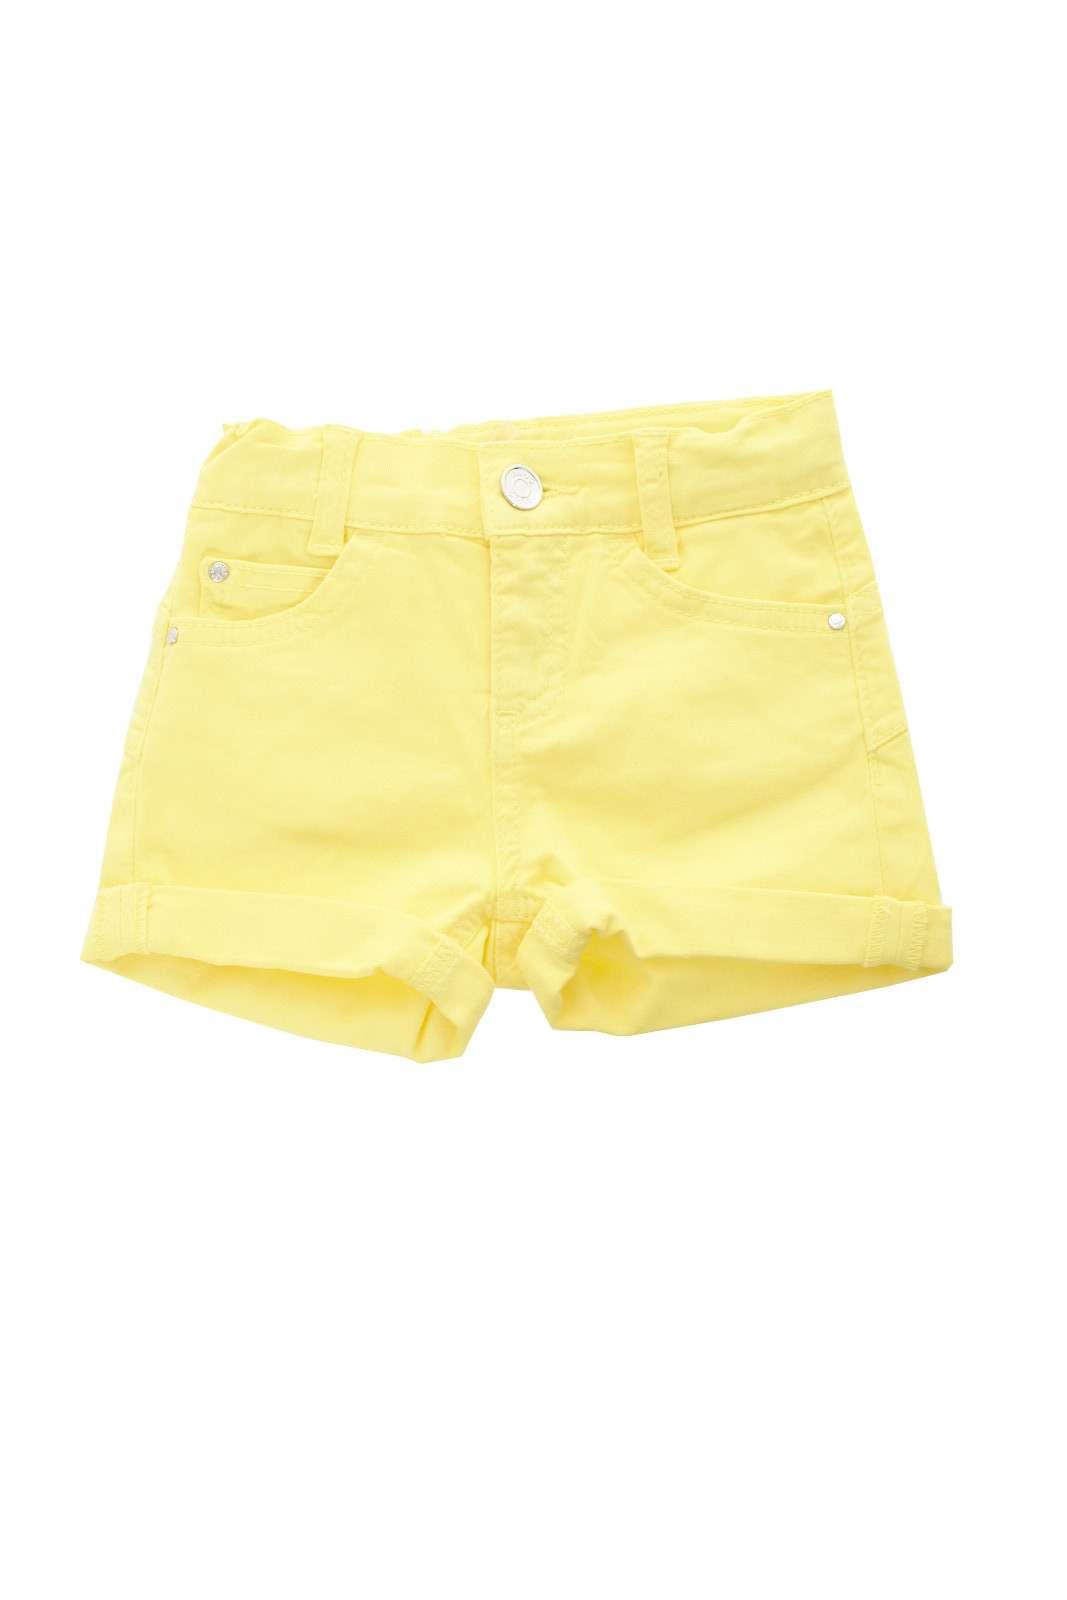 https://www.parmax.com/media/catalog/product/a/i/PE-outlet_parmax-shorts-bambina-Liu-Jo-k19088-A.jpg